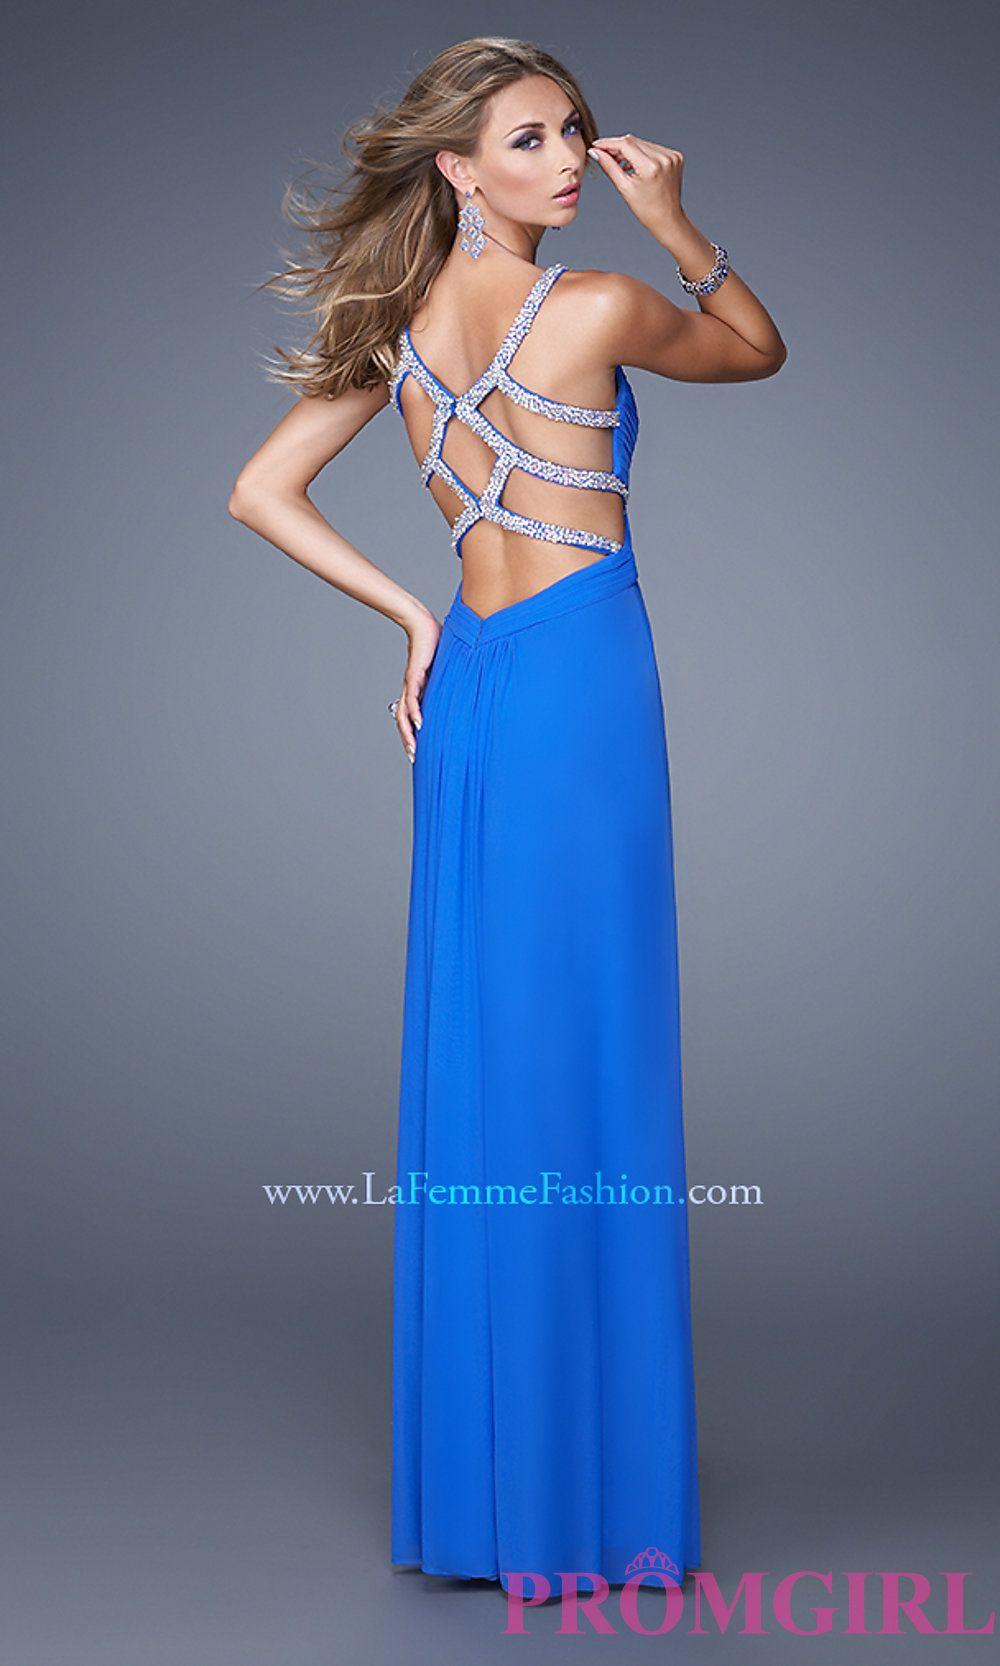 Floor Length La Femme Prom Dress with Beaded Back LF-21021 | dresses ...